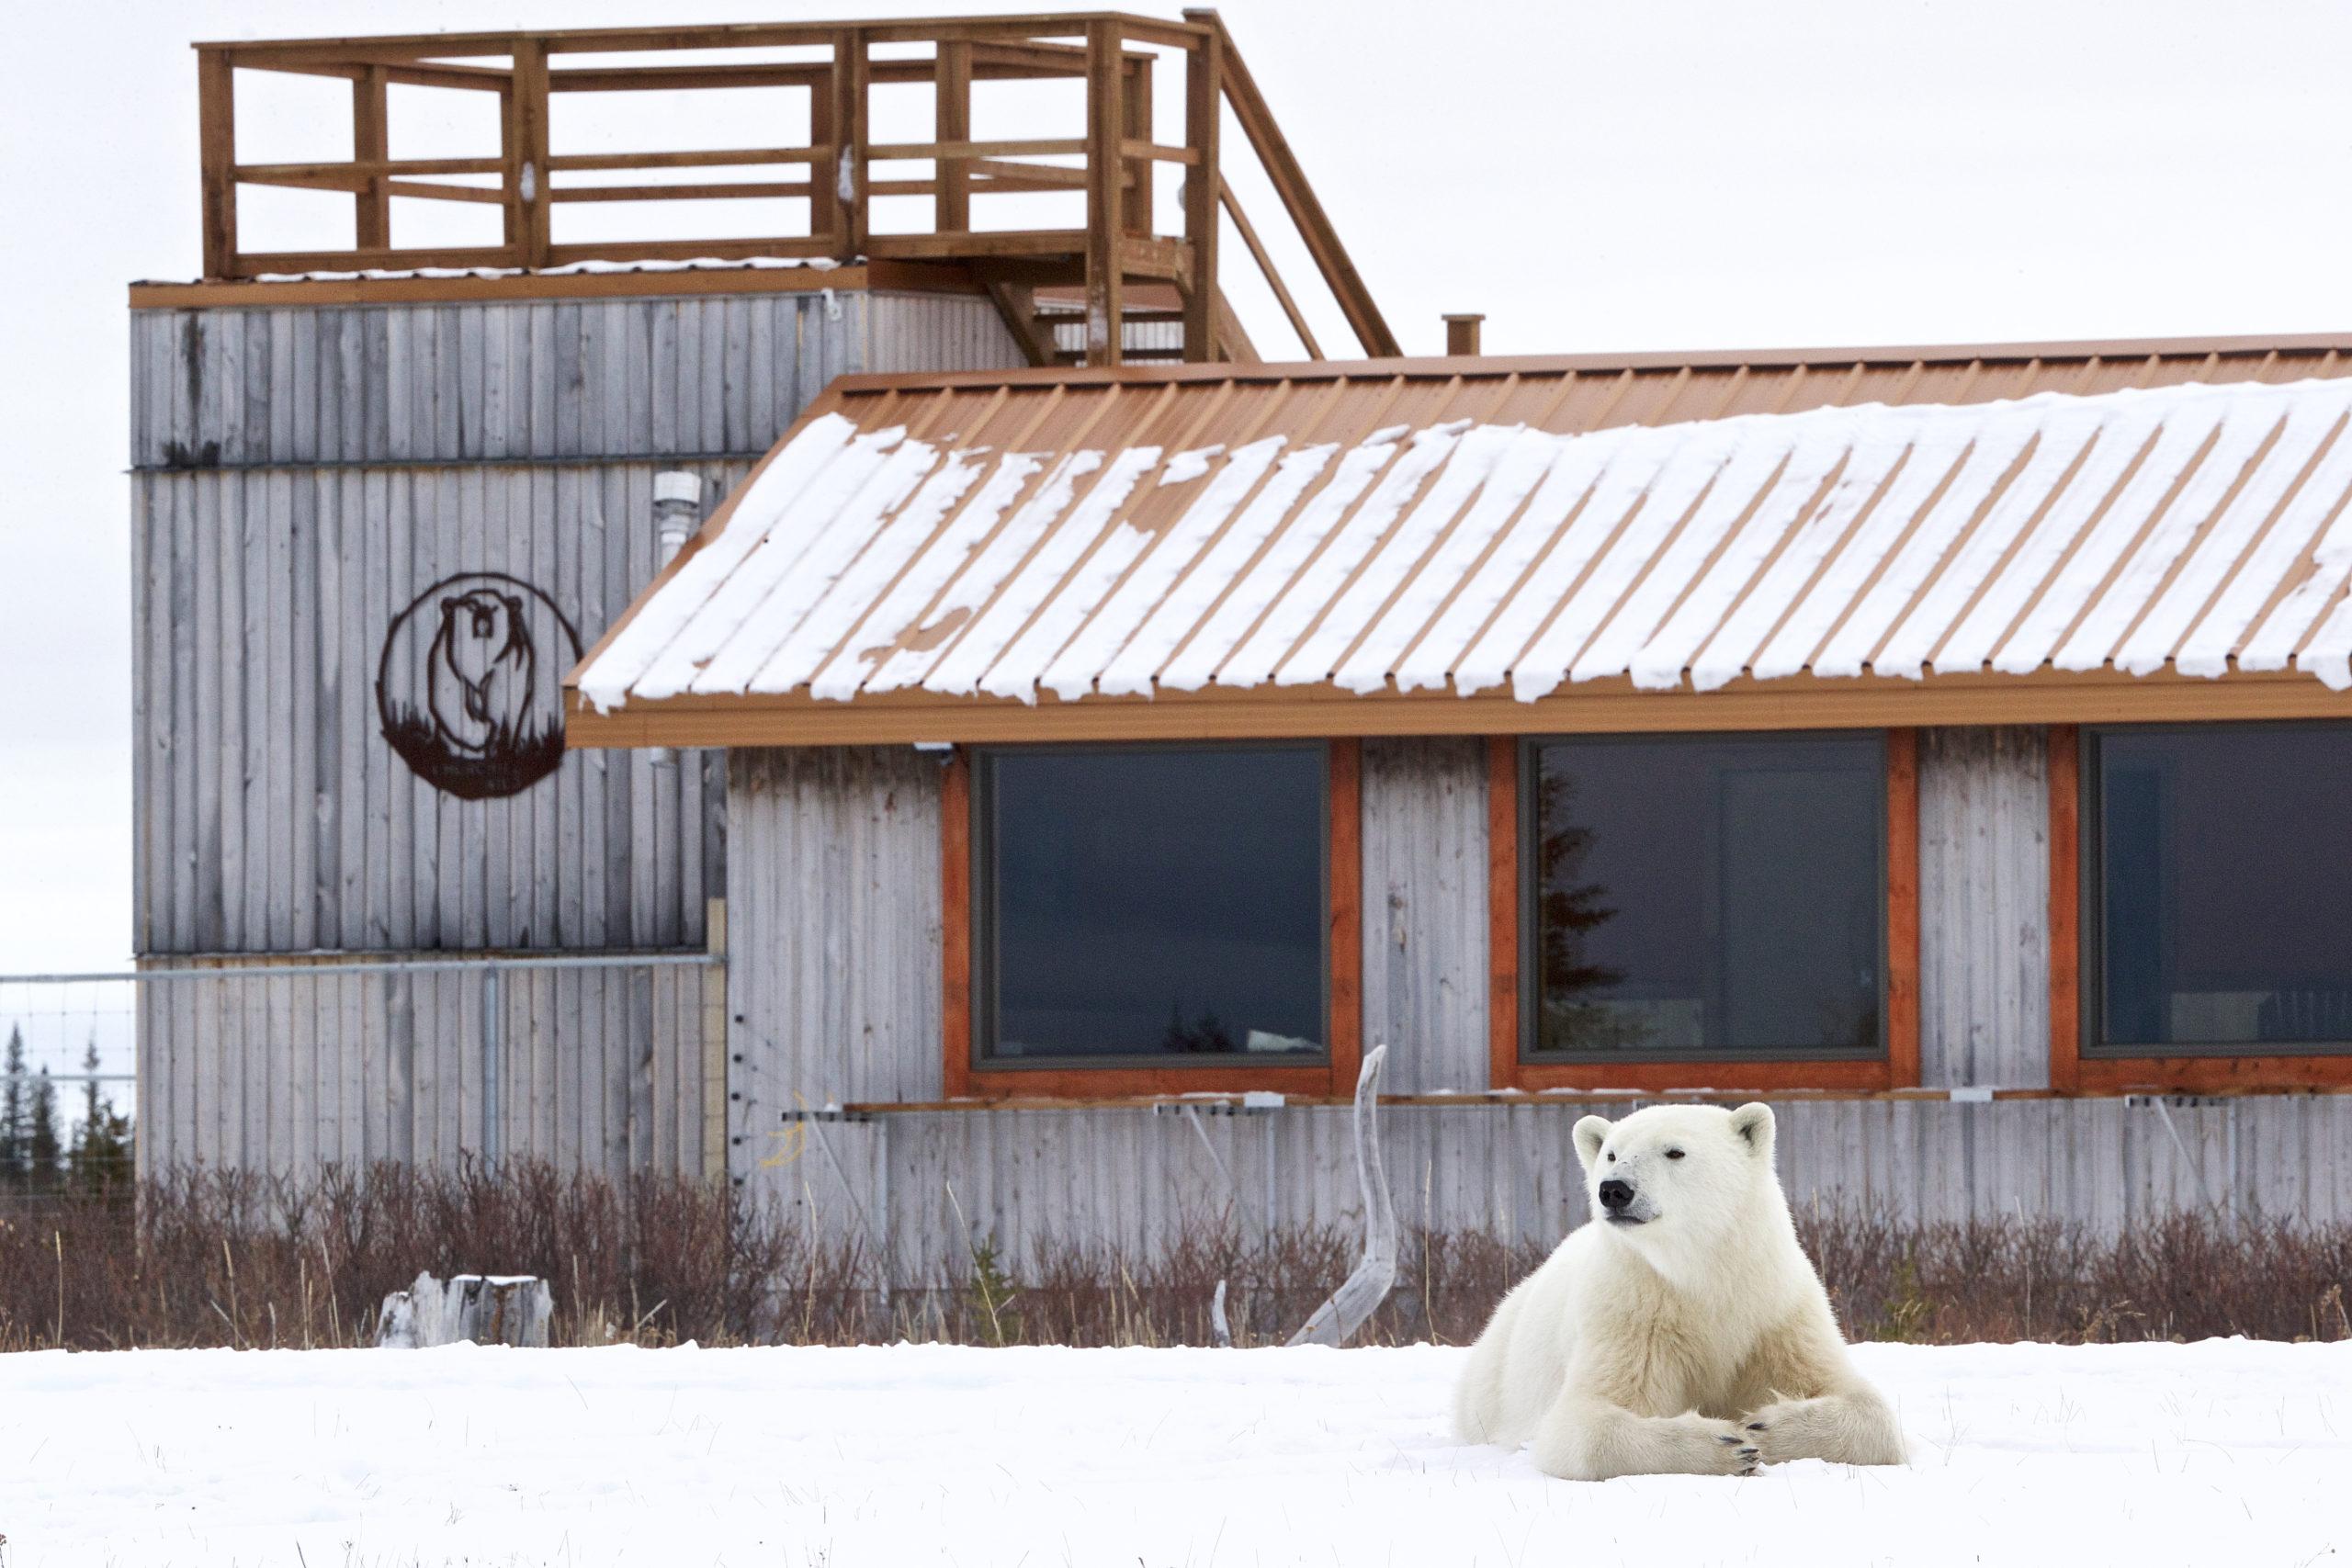 Polar bear in front of Nanuk Polar Bear Lodge. Andy Skillen photo.